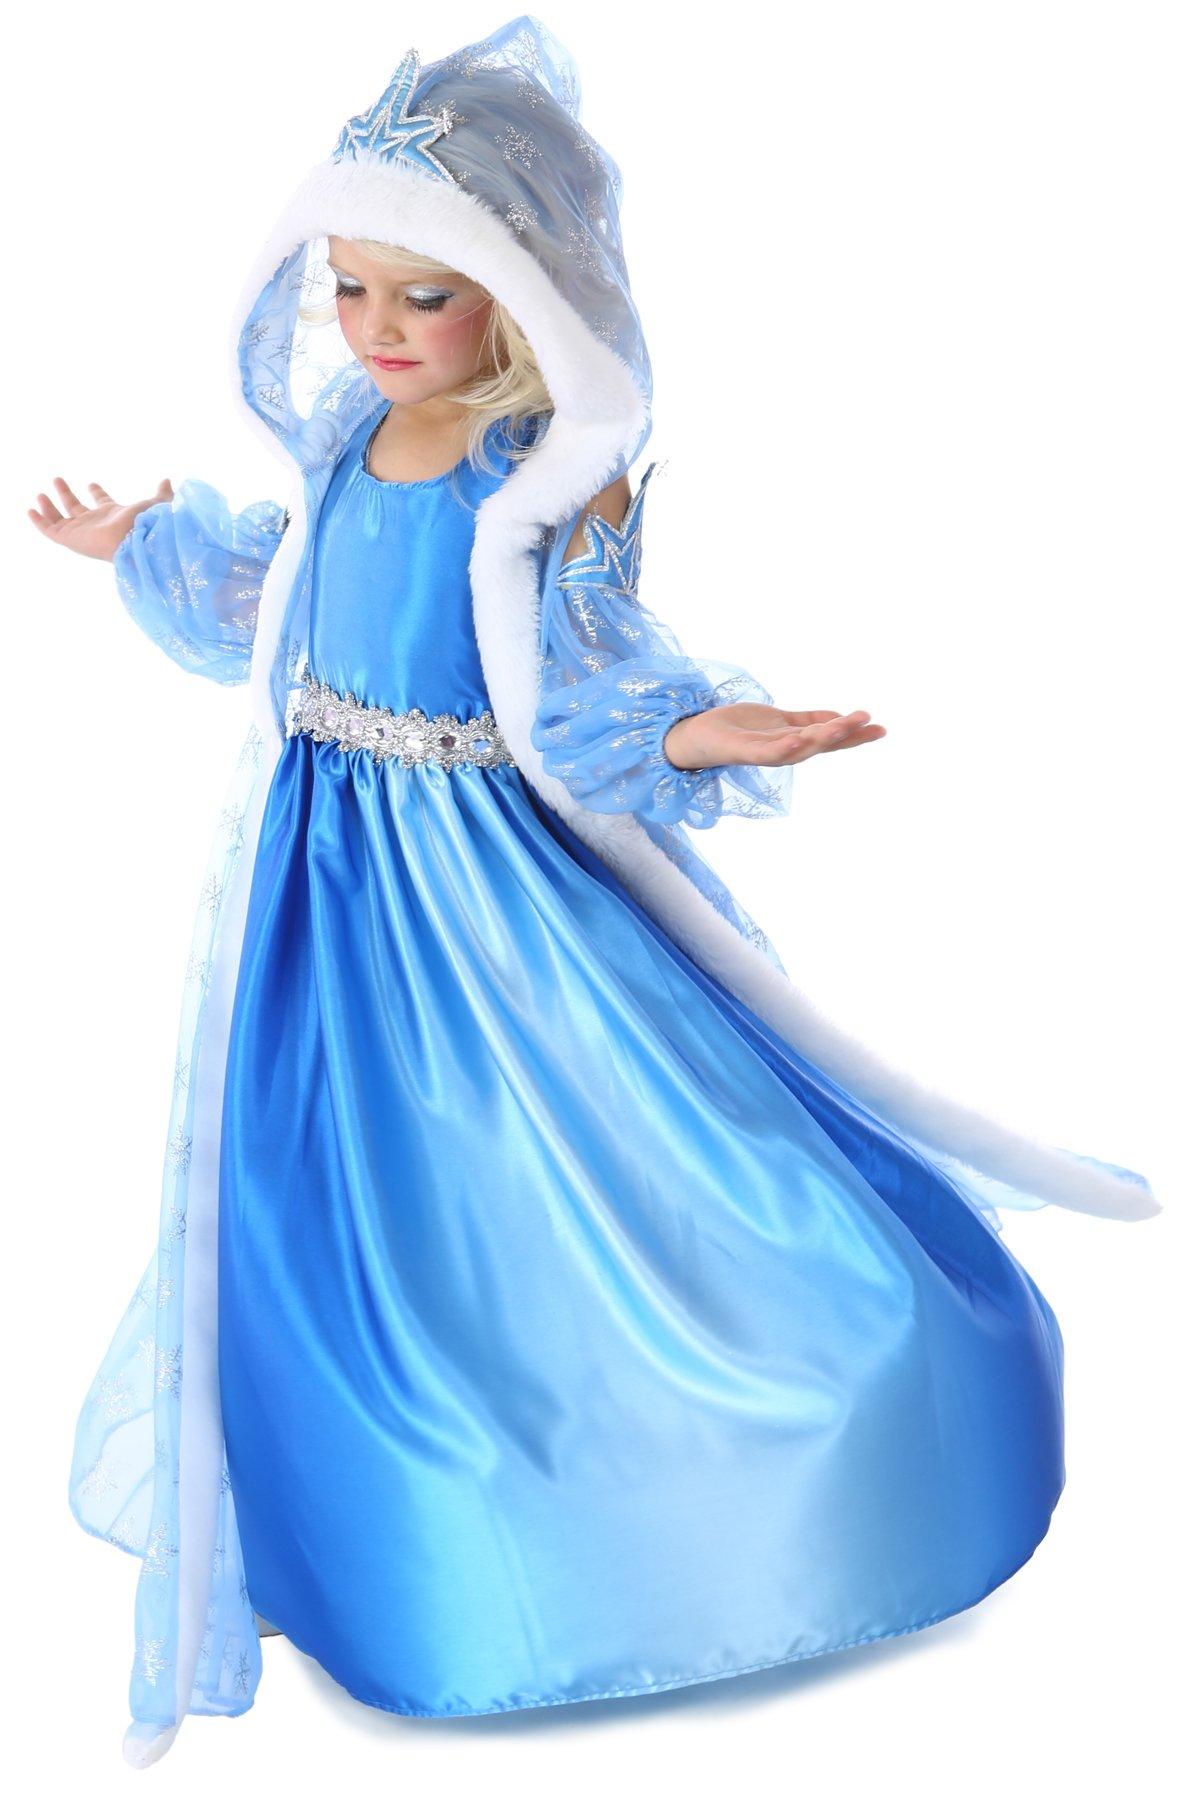 Princess Paradise Child Icelyn Winter Princess Costume, Multicolor, Small/6